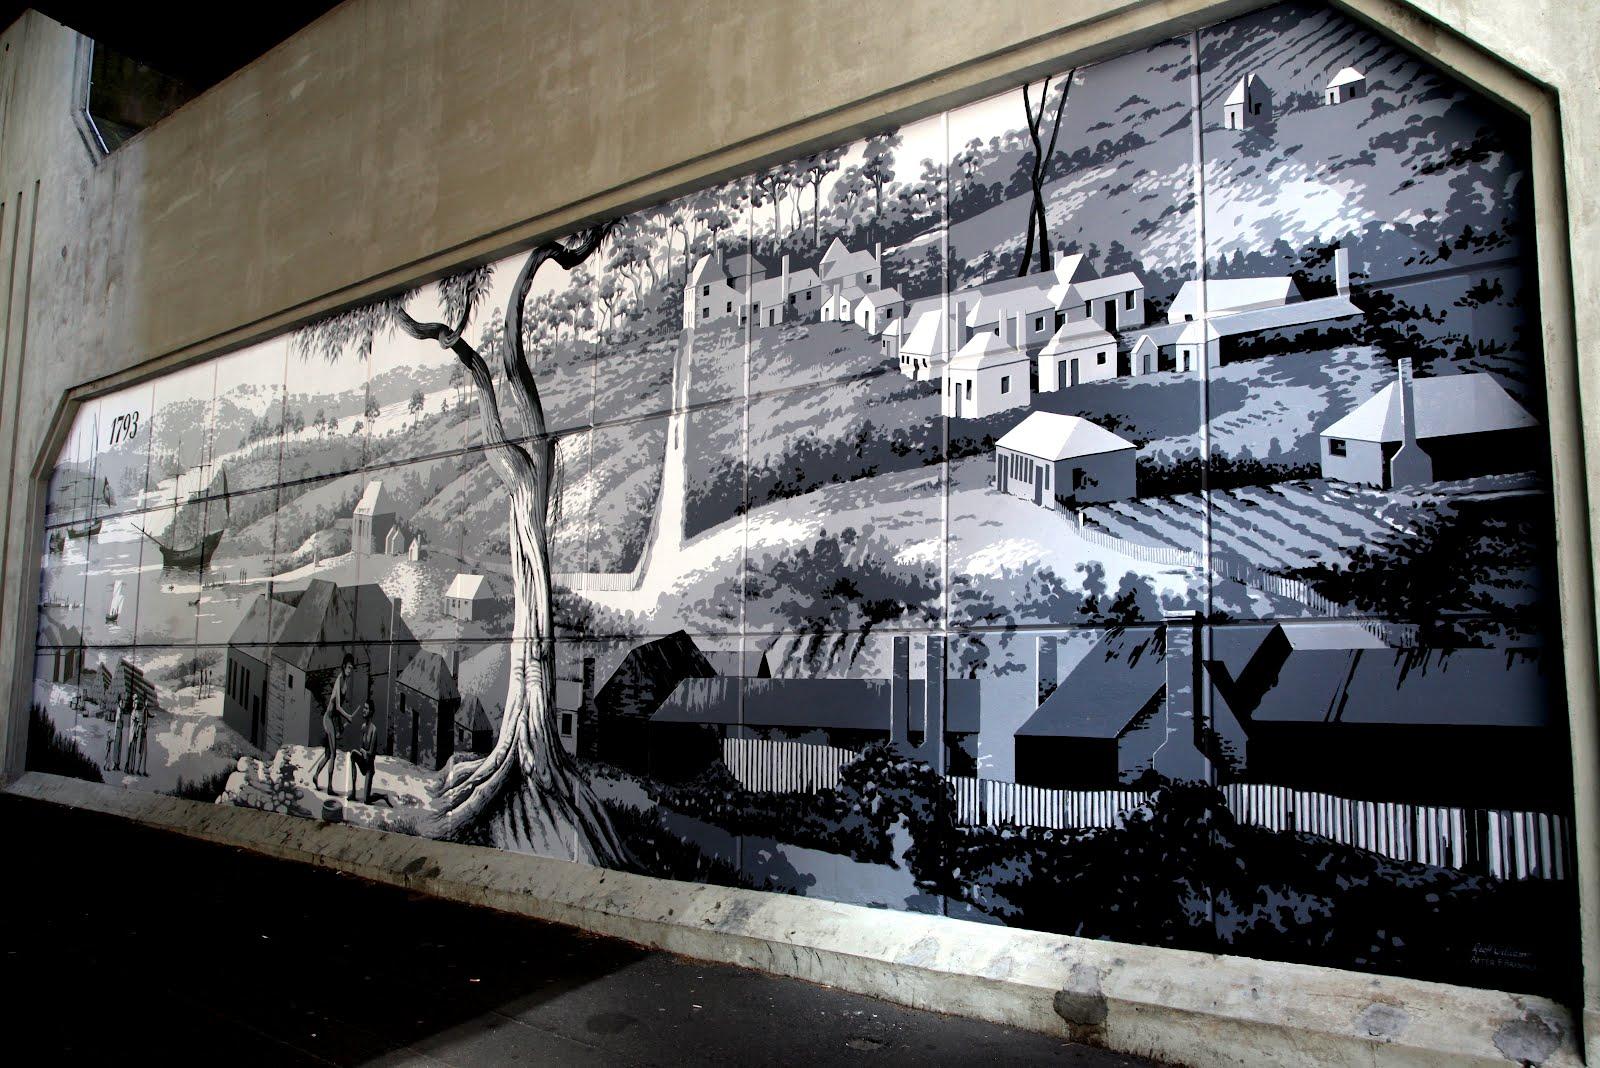 Arkhangelsk: barracks, street art, wooden sidewalks and surreal Solombala